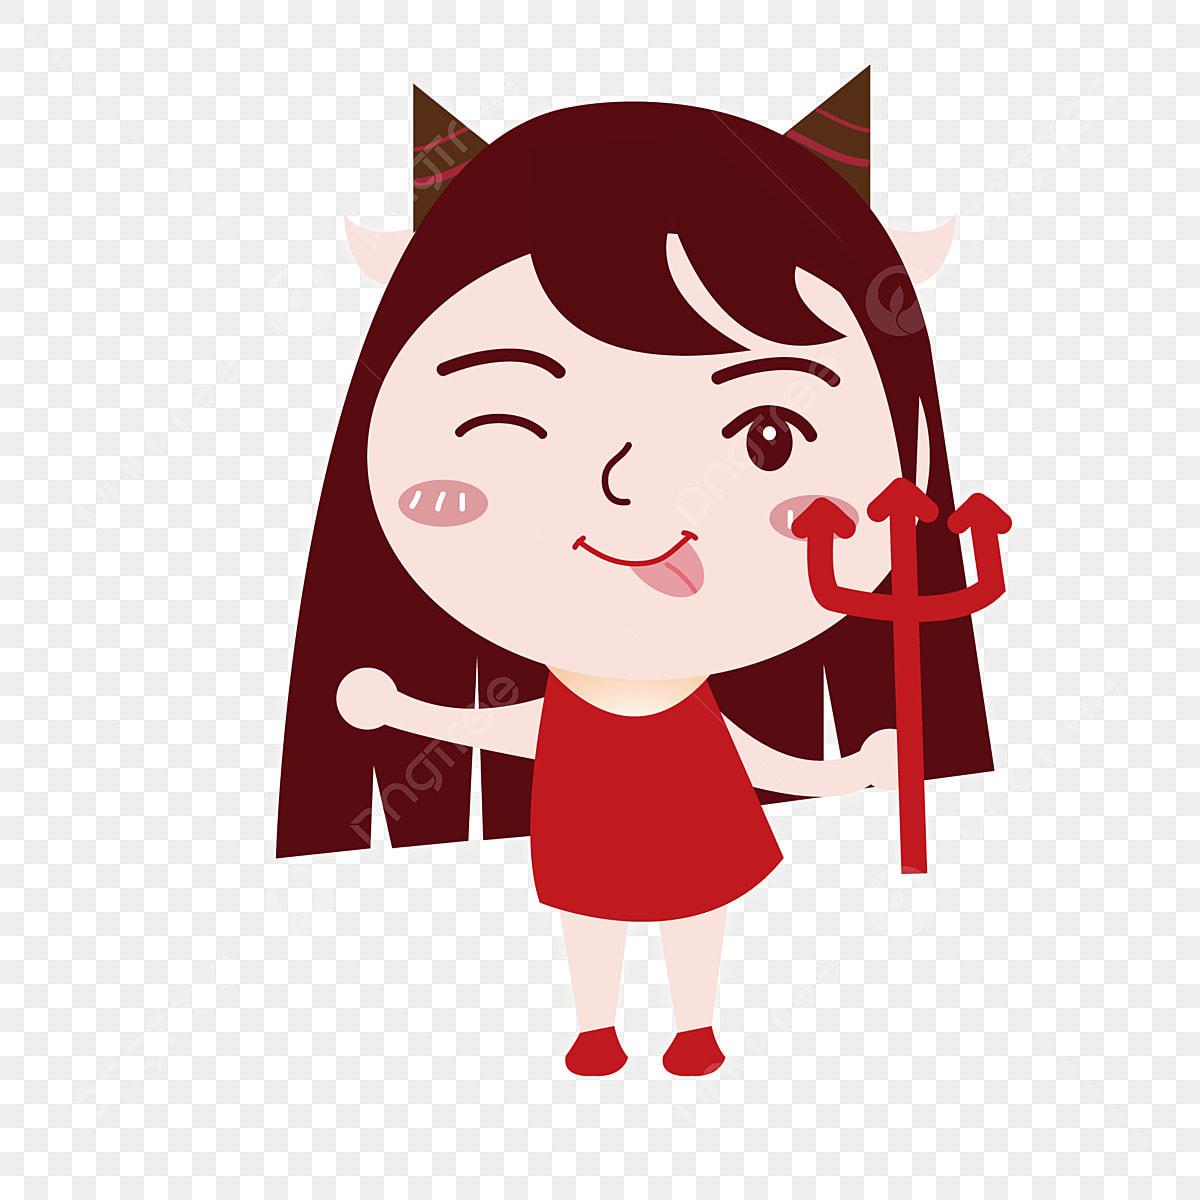 Capricorn element cartoon. Funny girl ai character